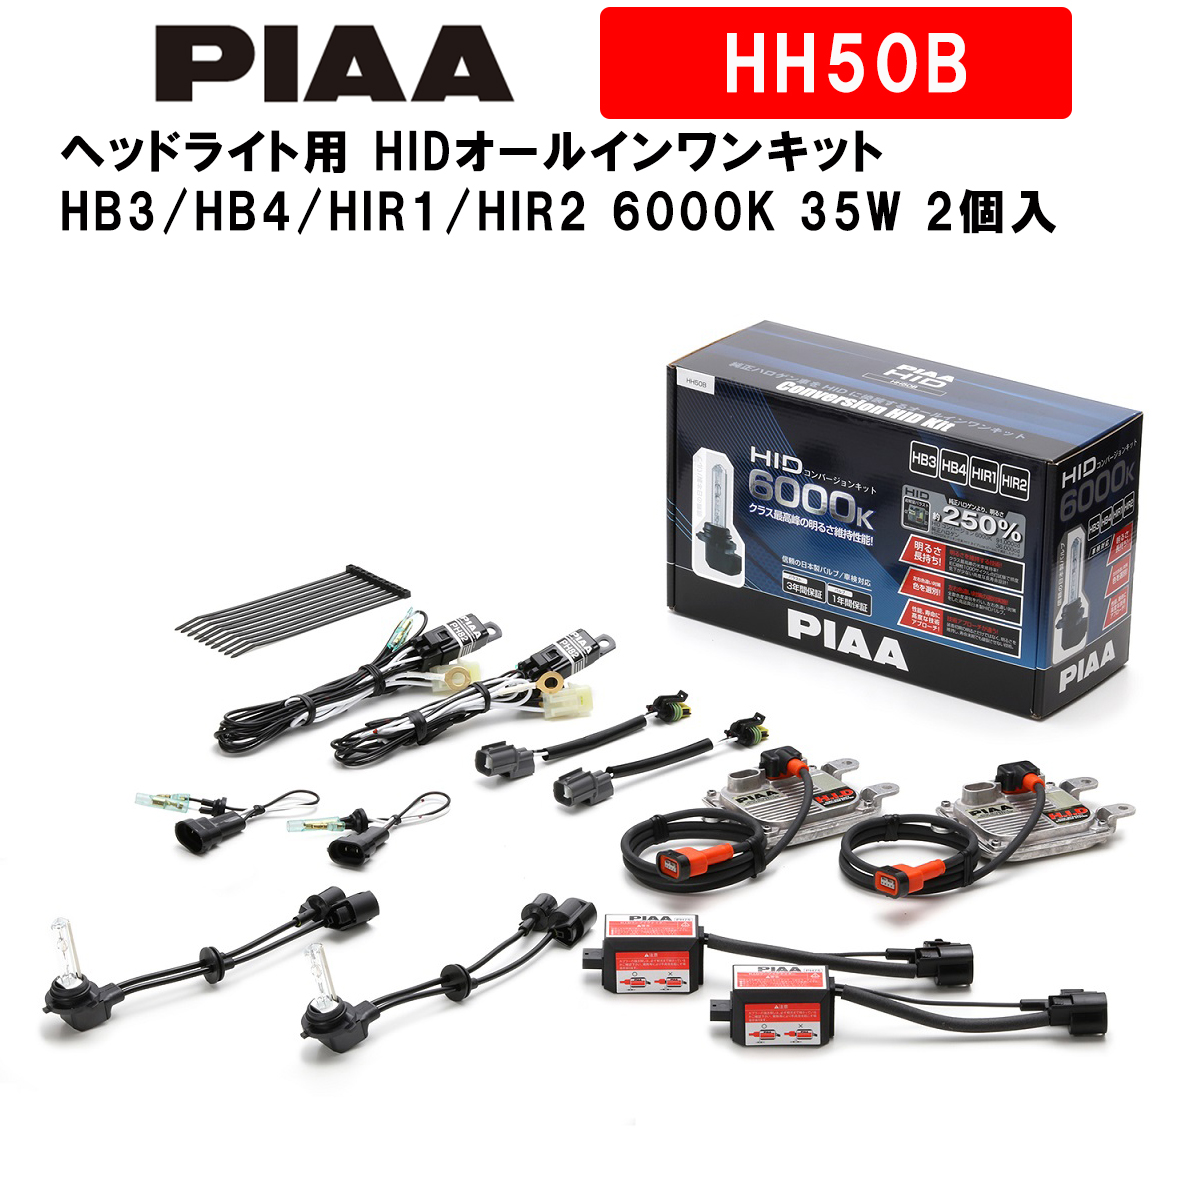 PIAA ピア ヘッドライト用 HIDオールインワンキット HB3/HB4/HIR1/HIR2 6000K 35W 2個入 日本製 輸入車対応 車検対応 安心のメーカー保証付 バラスト3年 バルブ1年 HH50B